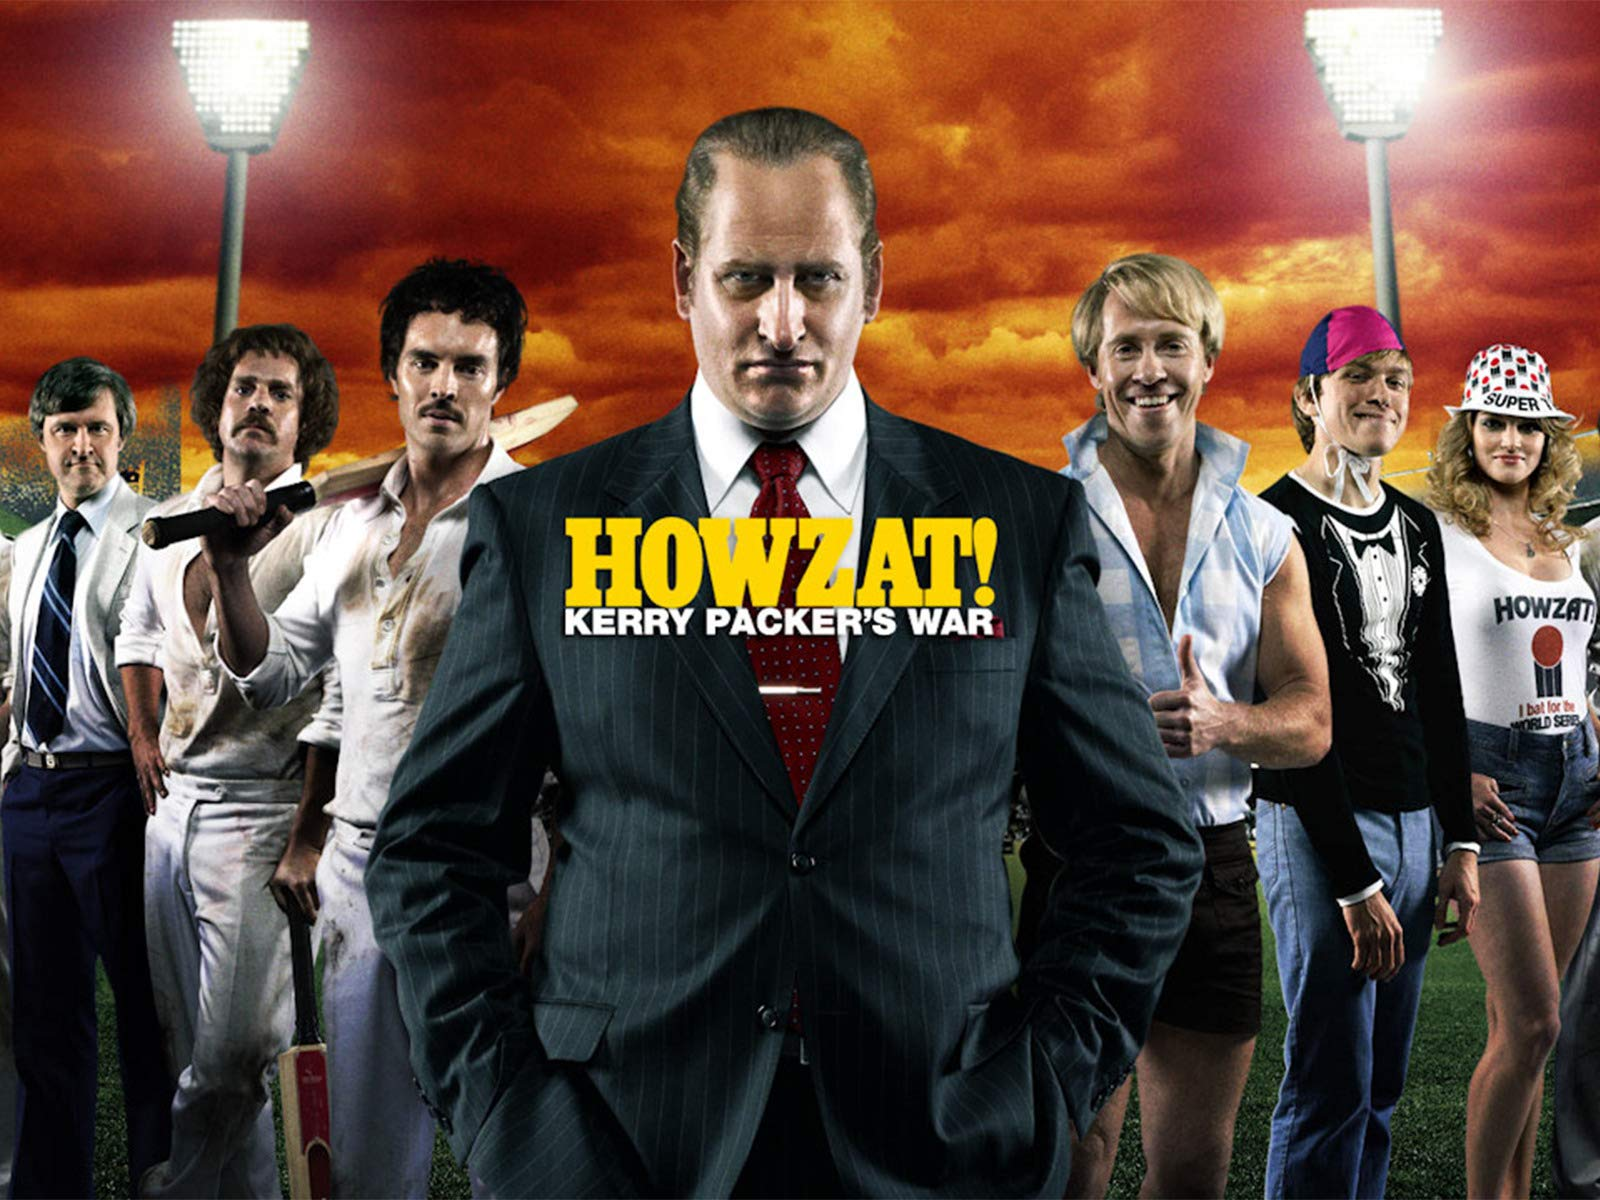 Howzat! Kerry Packer's War - Season 1